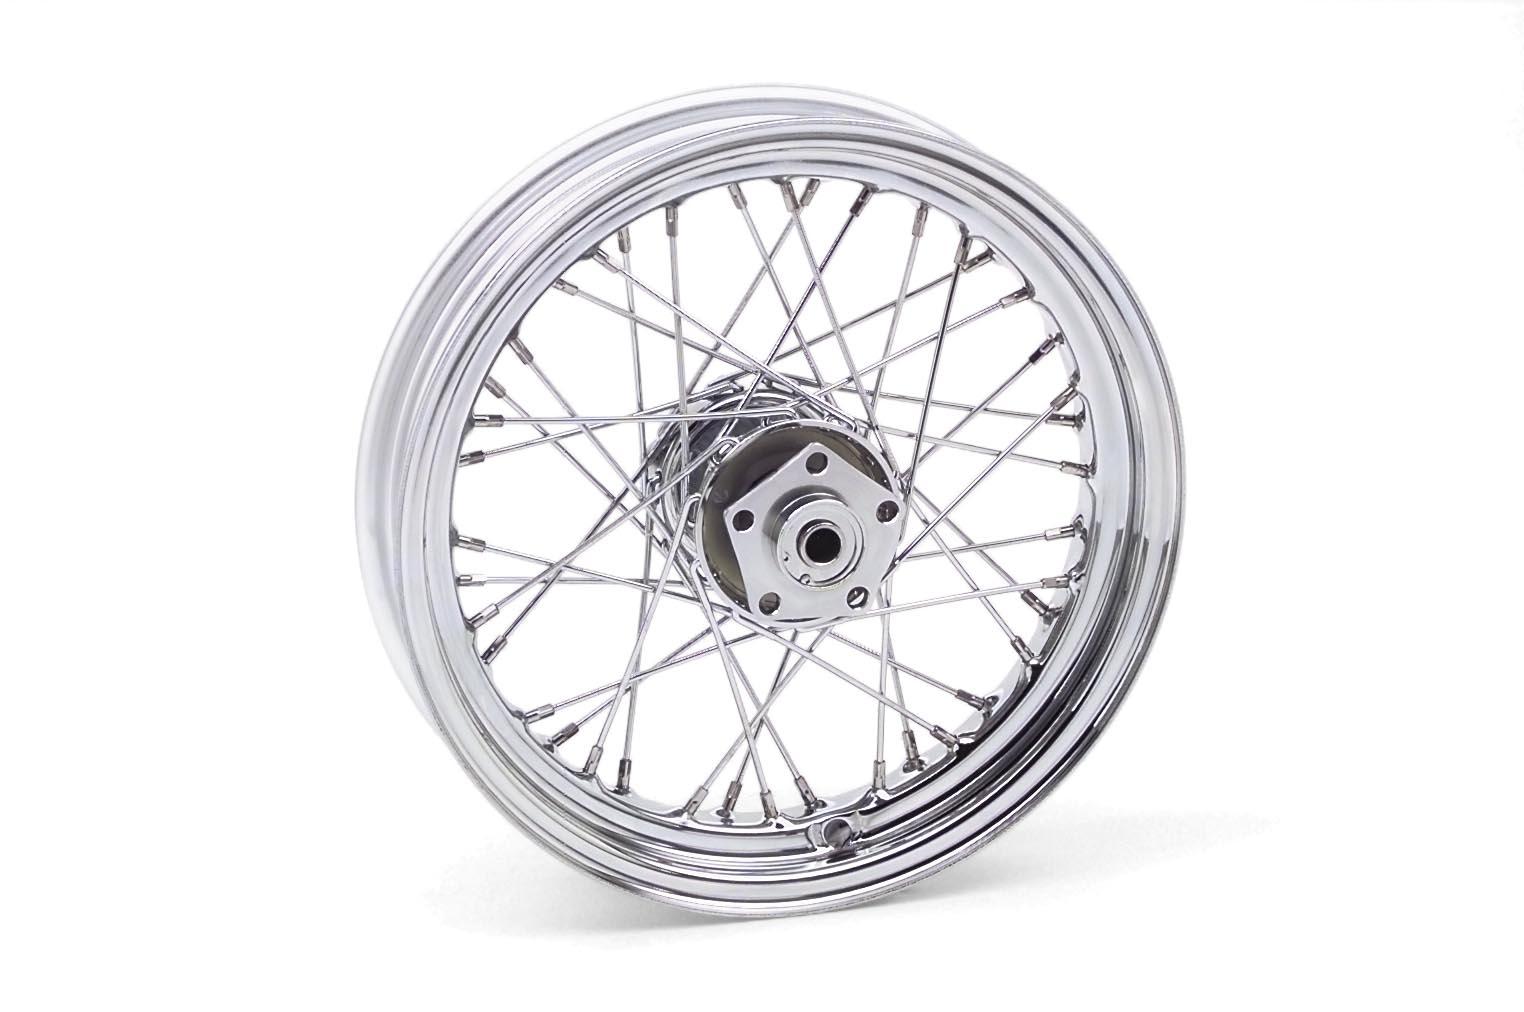 16x3.0in. Dual Flange Wheel